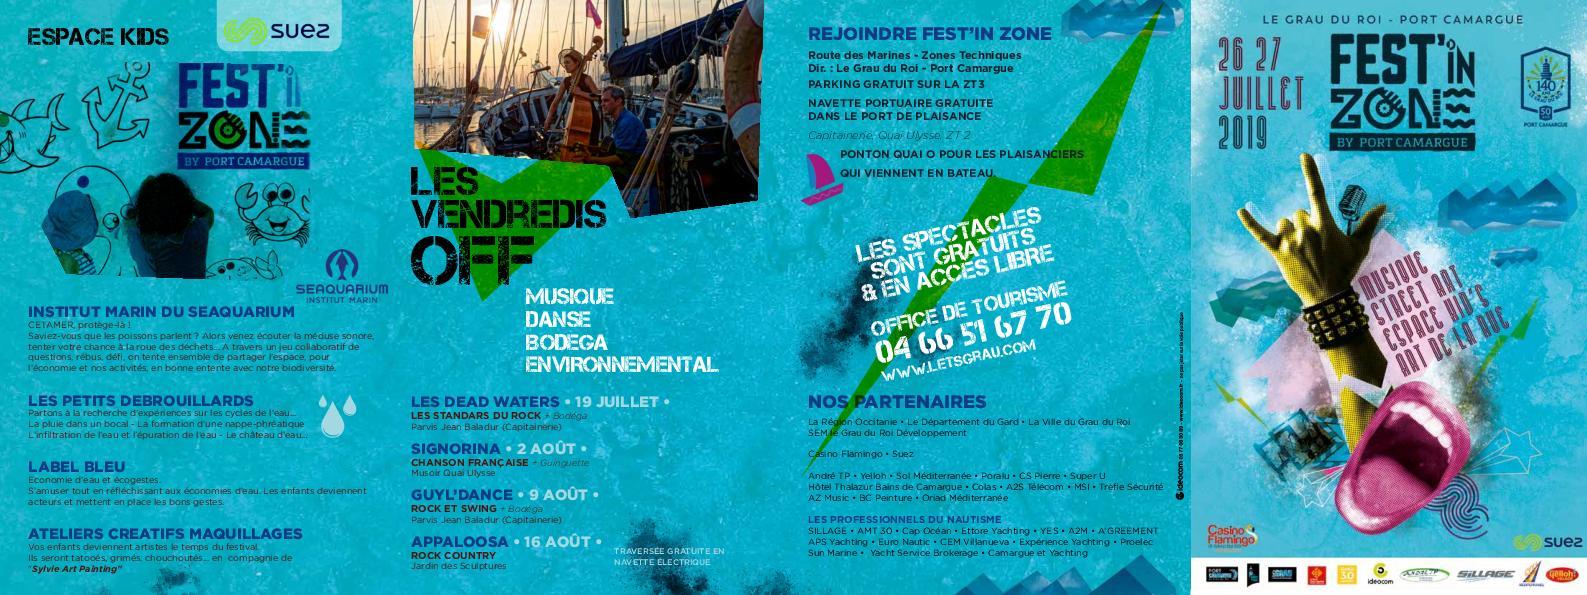 Calaméo - Programme Fest\'in Zone - édition 2019